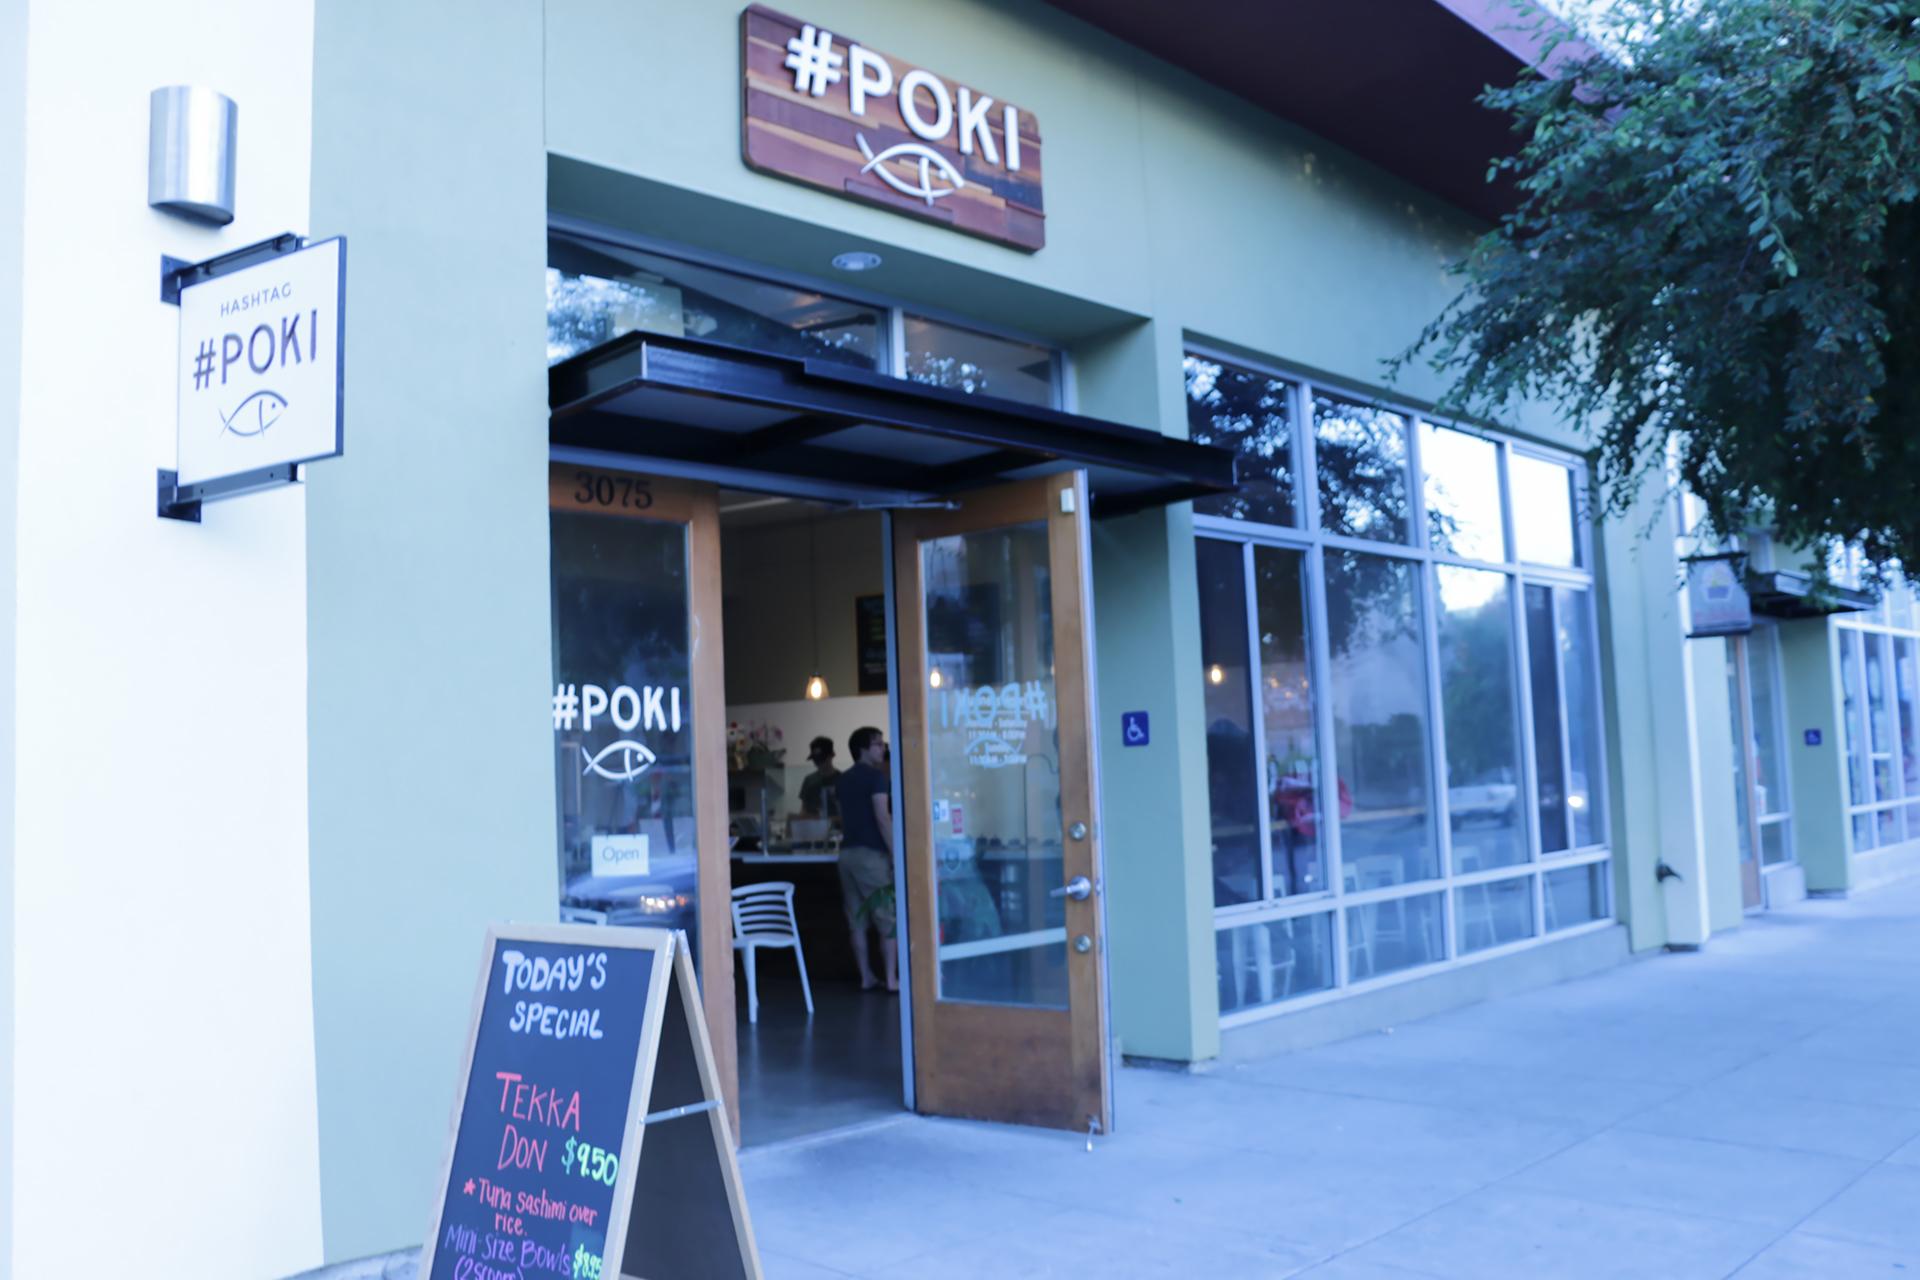 Hashtag #Poki Brings Healthful Fast Food to South Berkeley ...